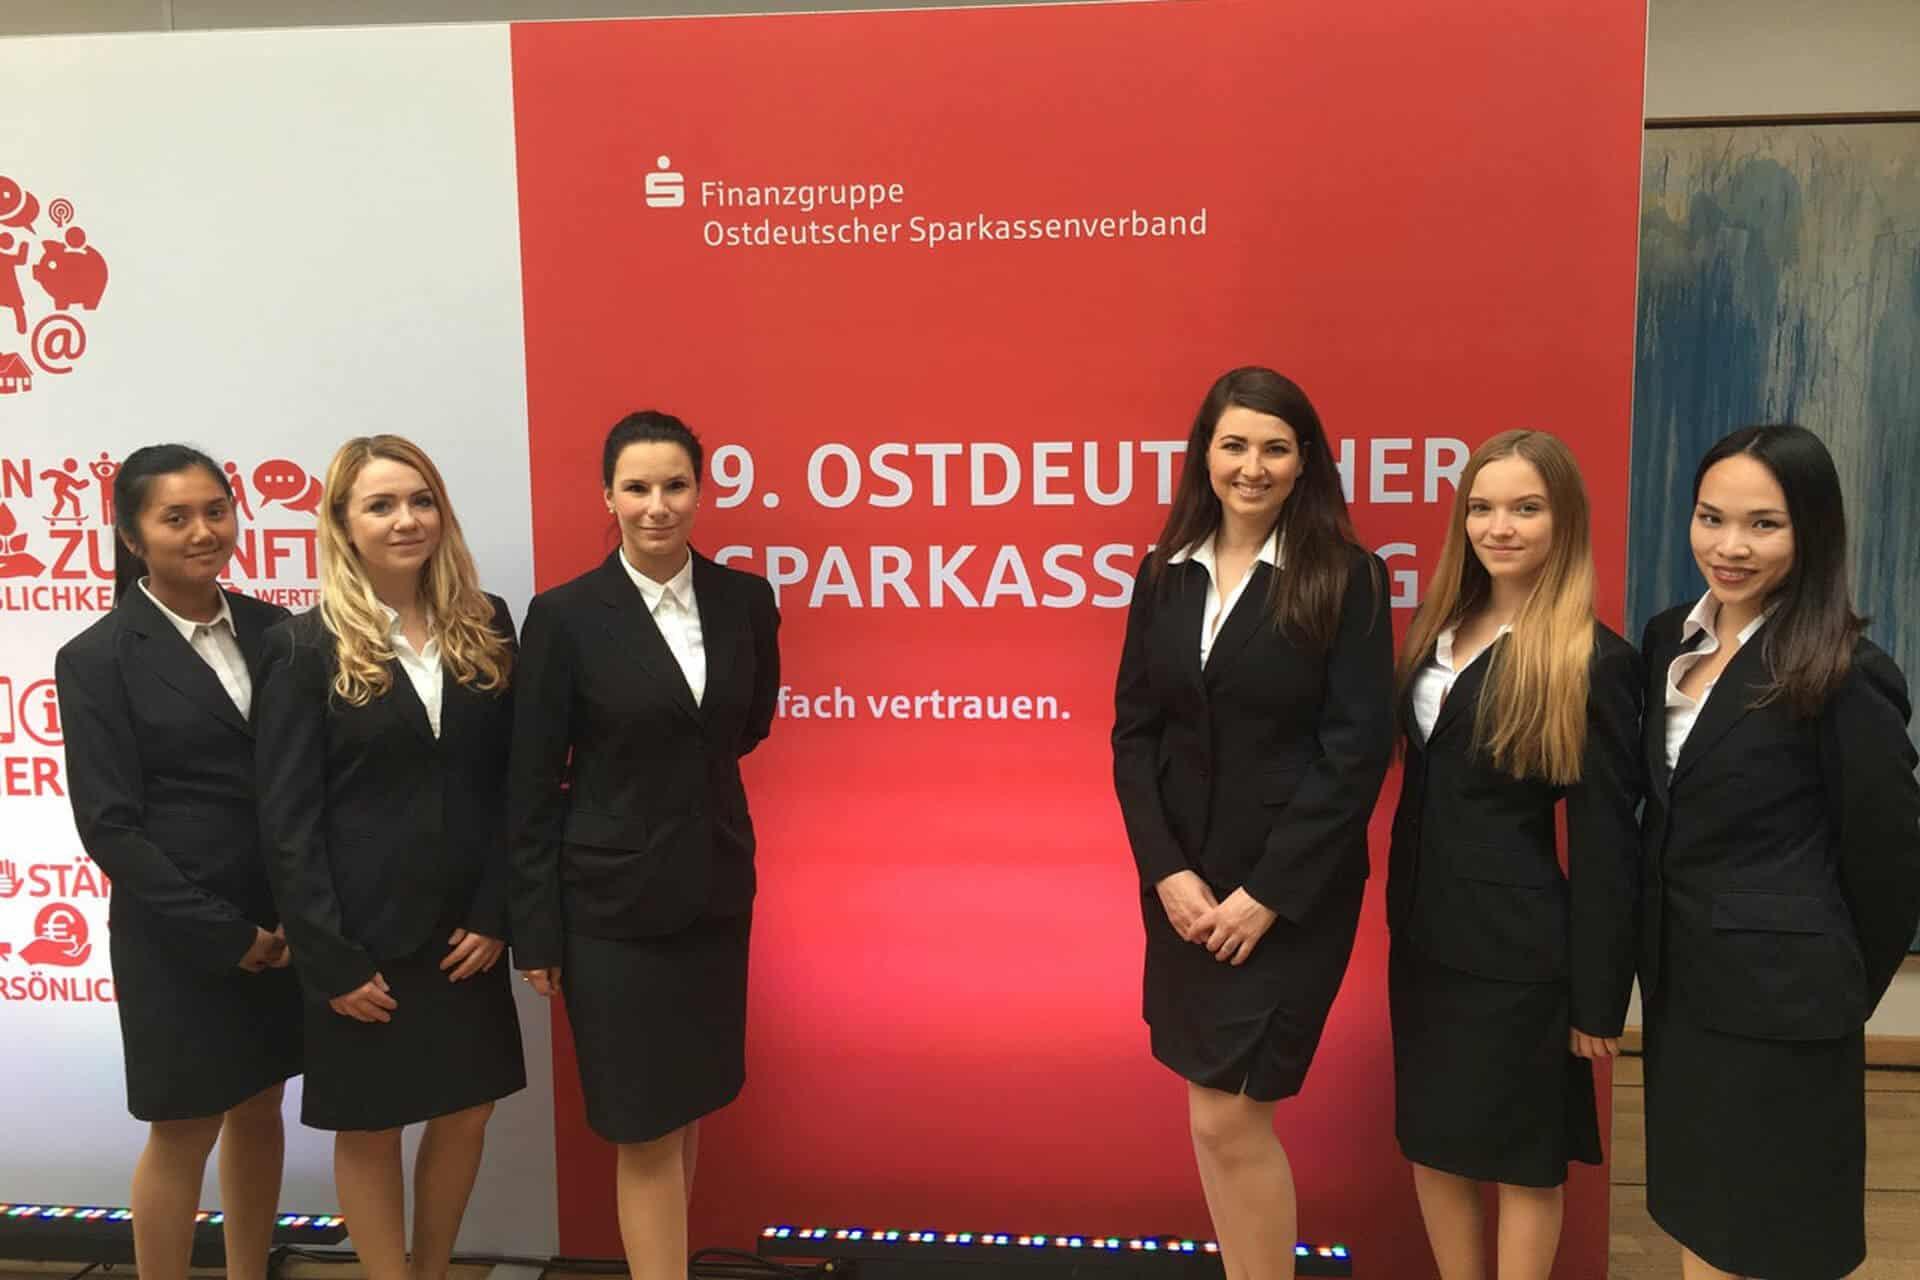 Ostdeutscher Sparkassentag Hostessen